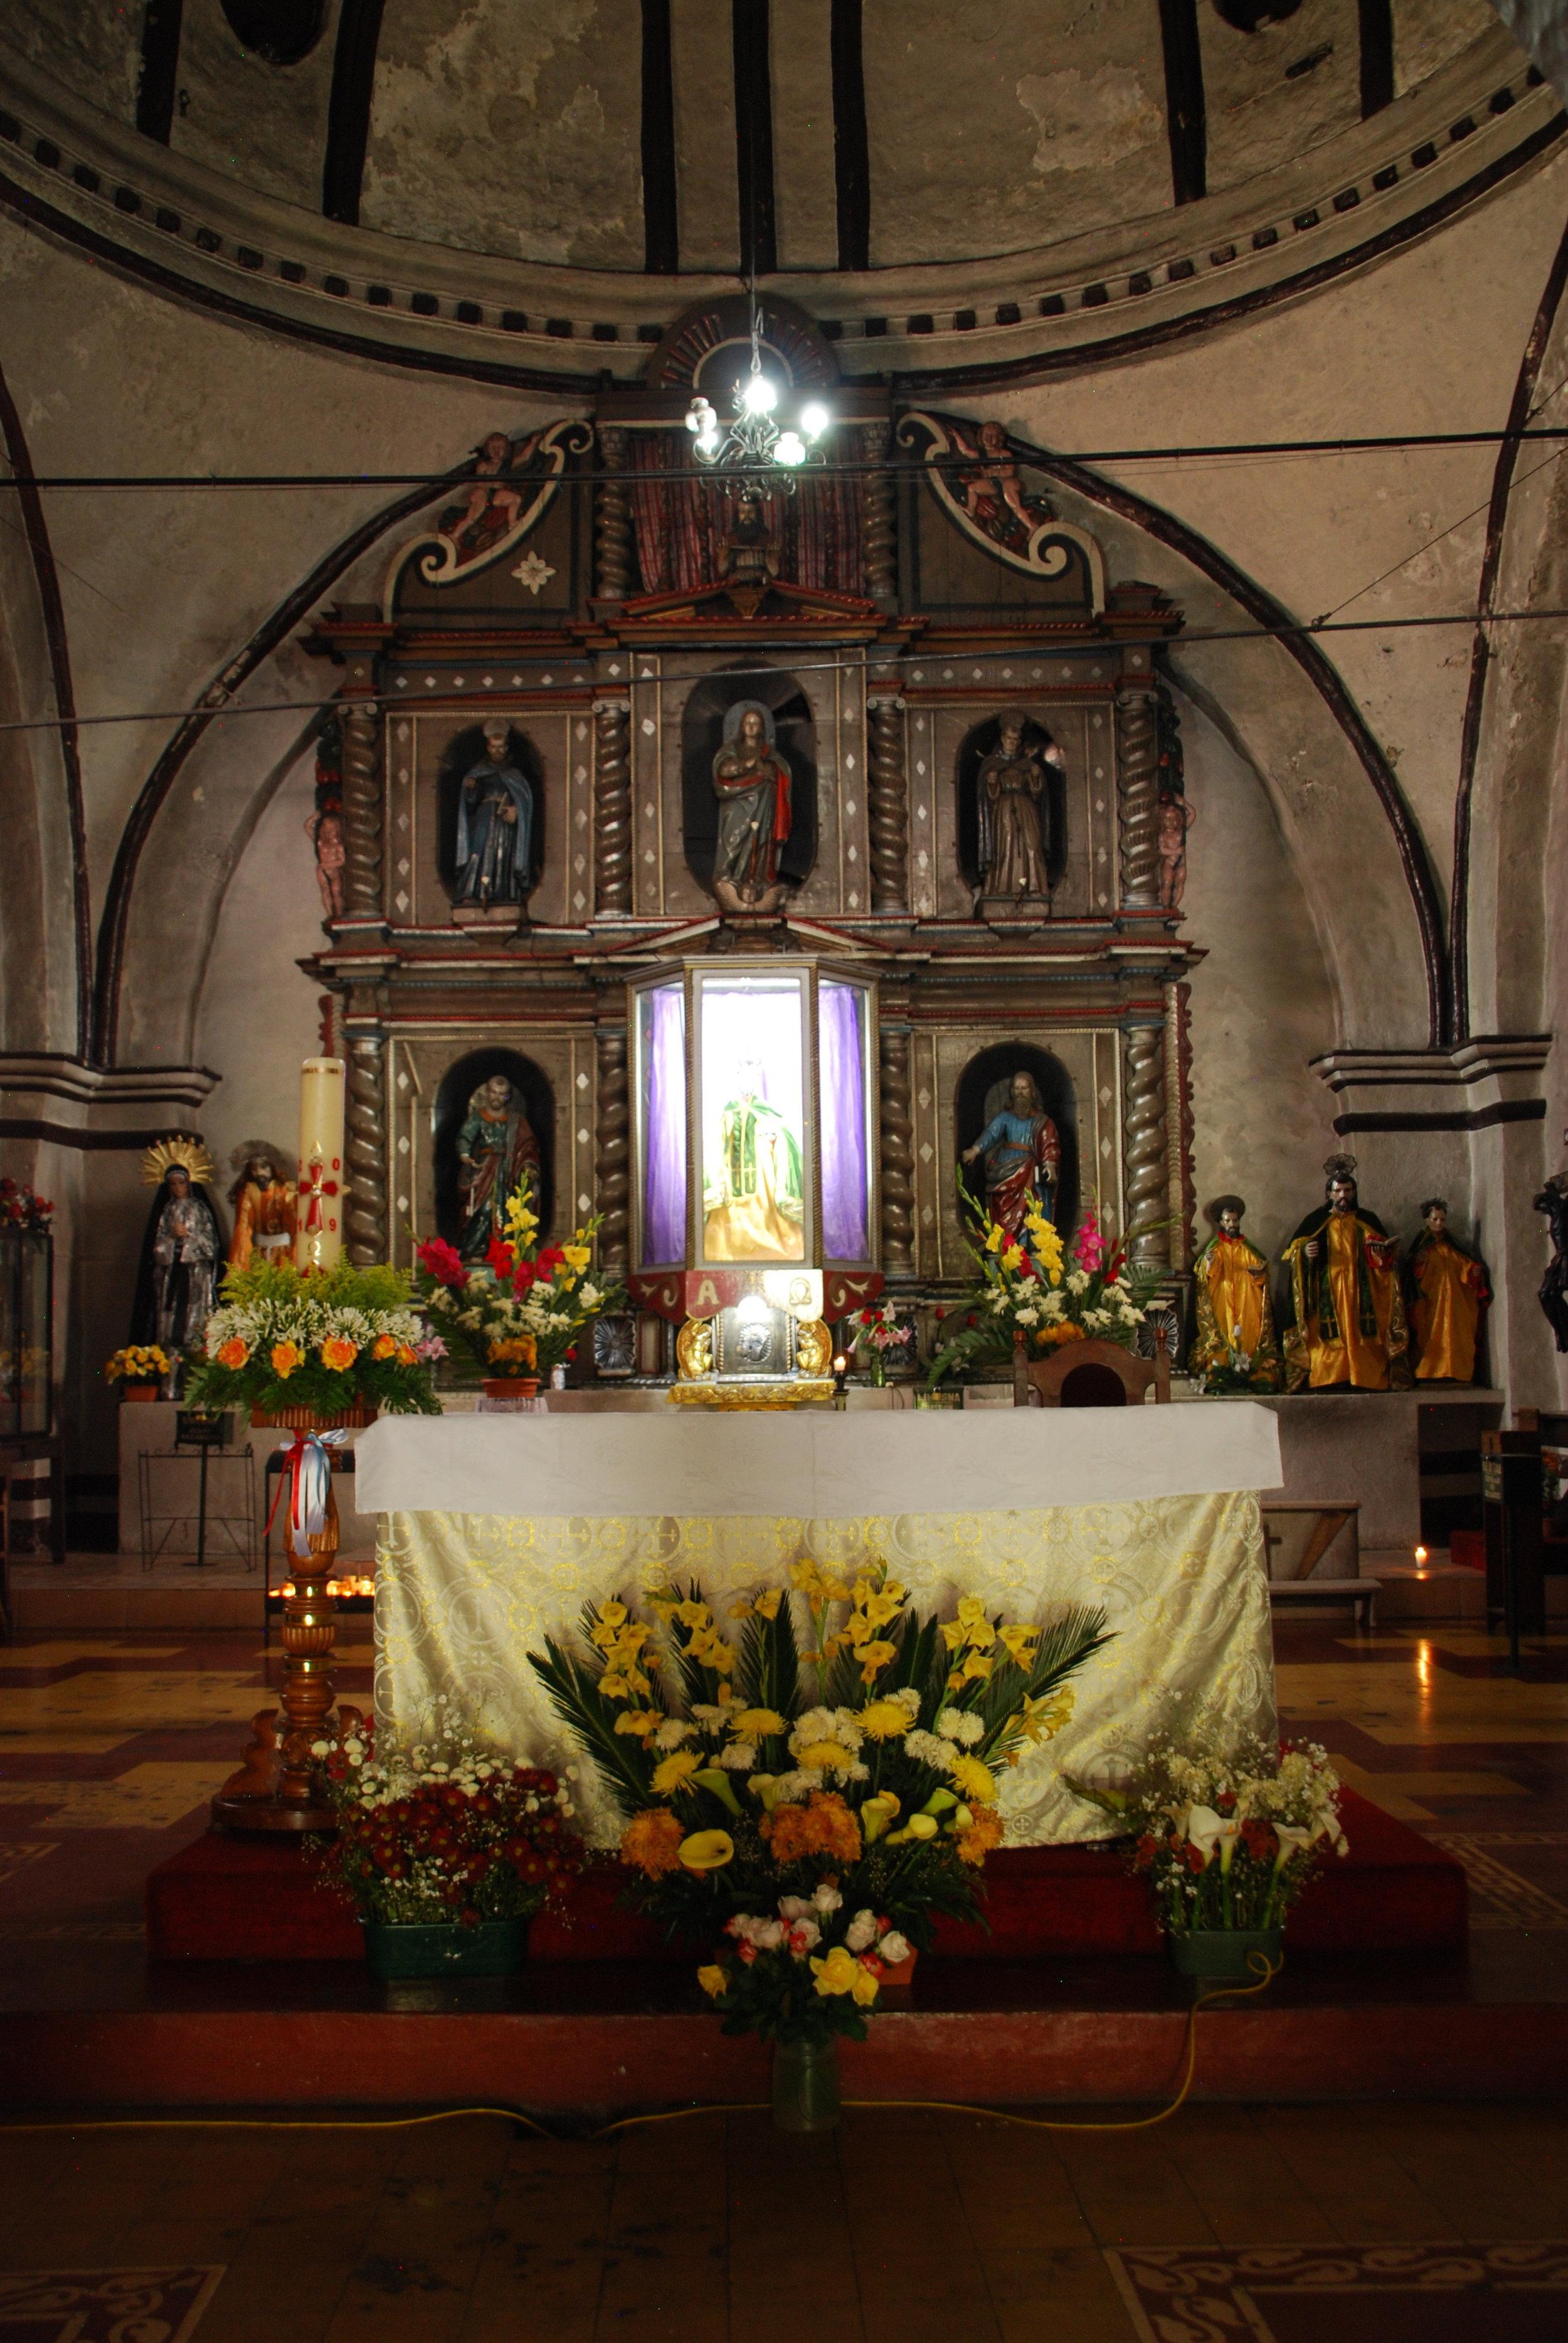 The main altar inside the church of San Lucas Toliman